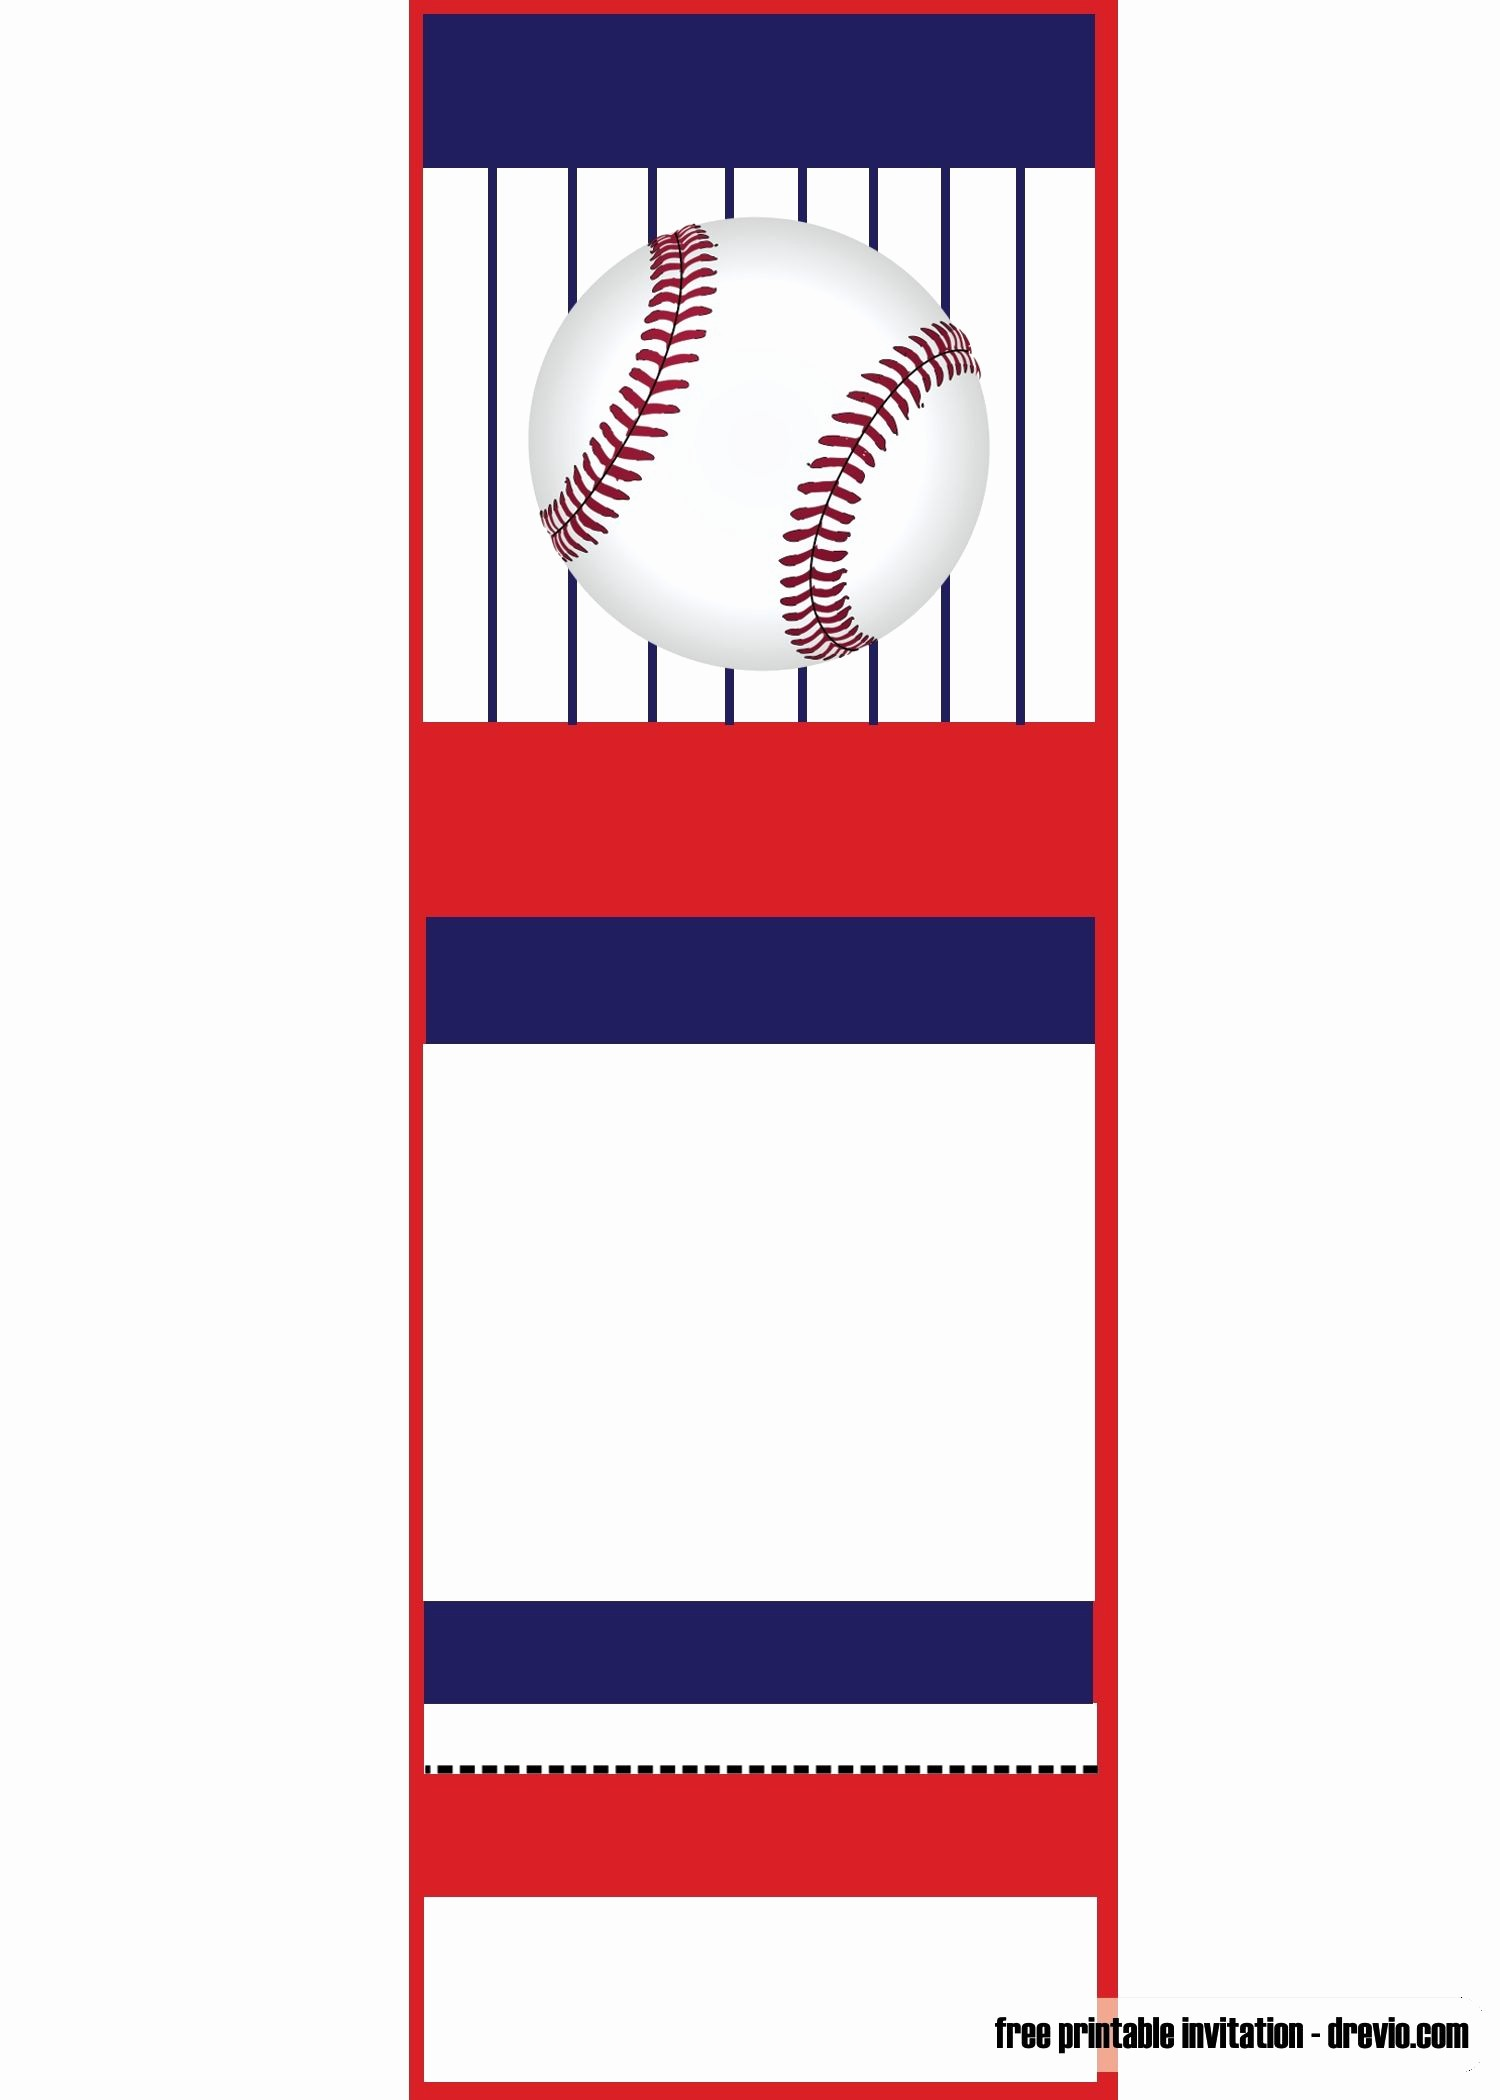 Baseball Ticket Invitation Template Free Elegant Free Printable Baseball Ticket Invitation